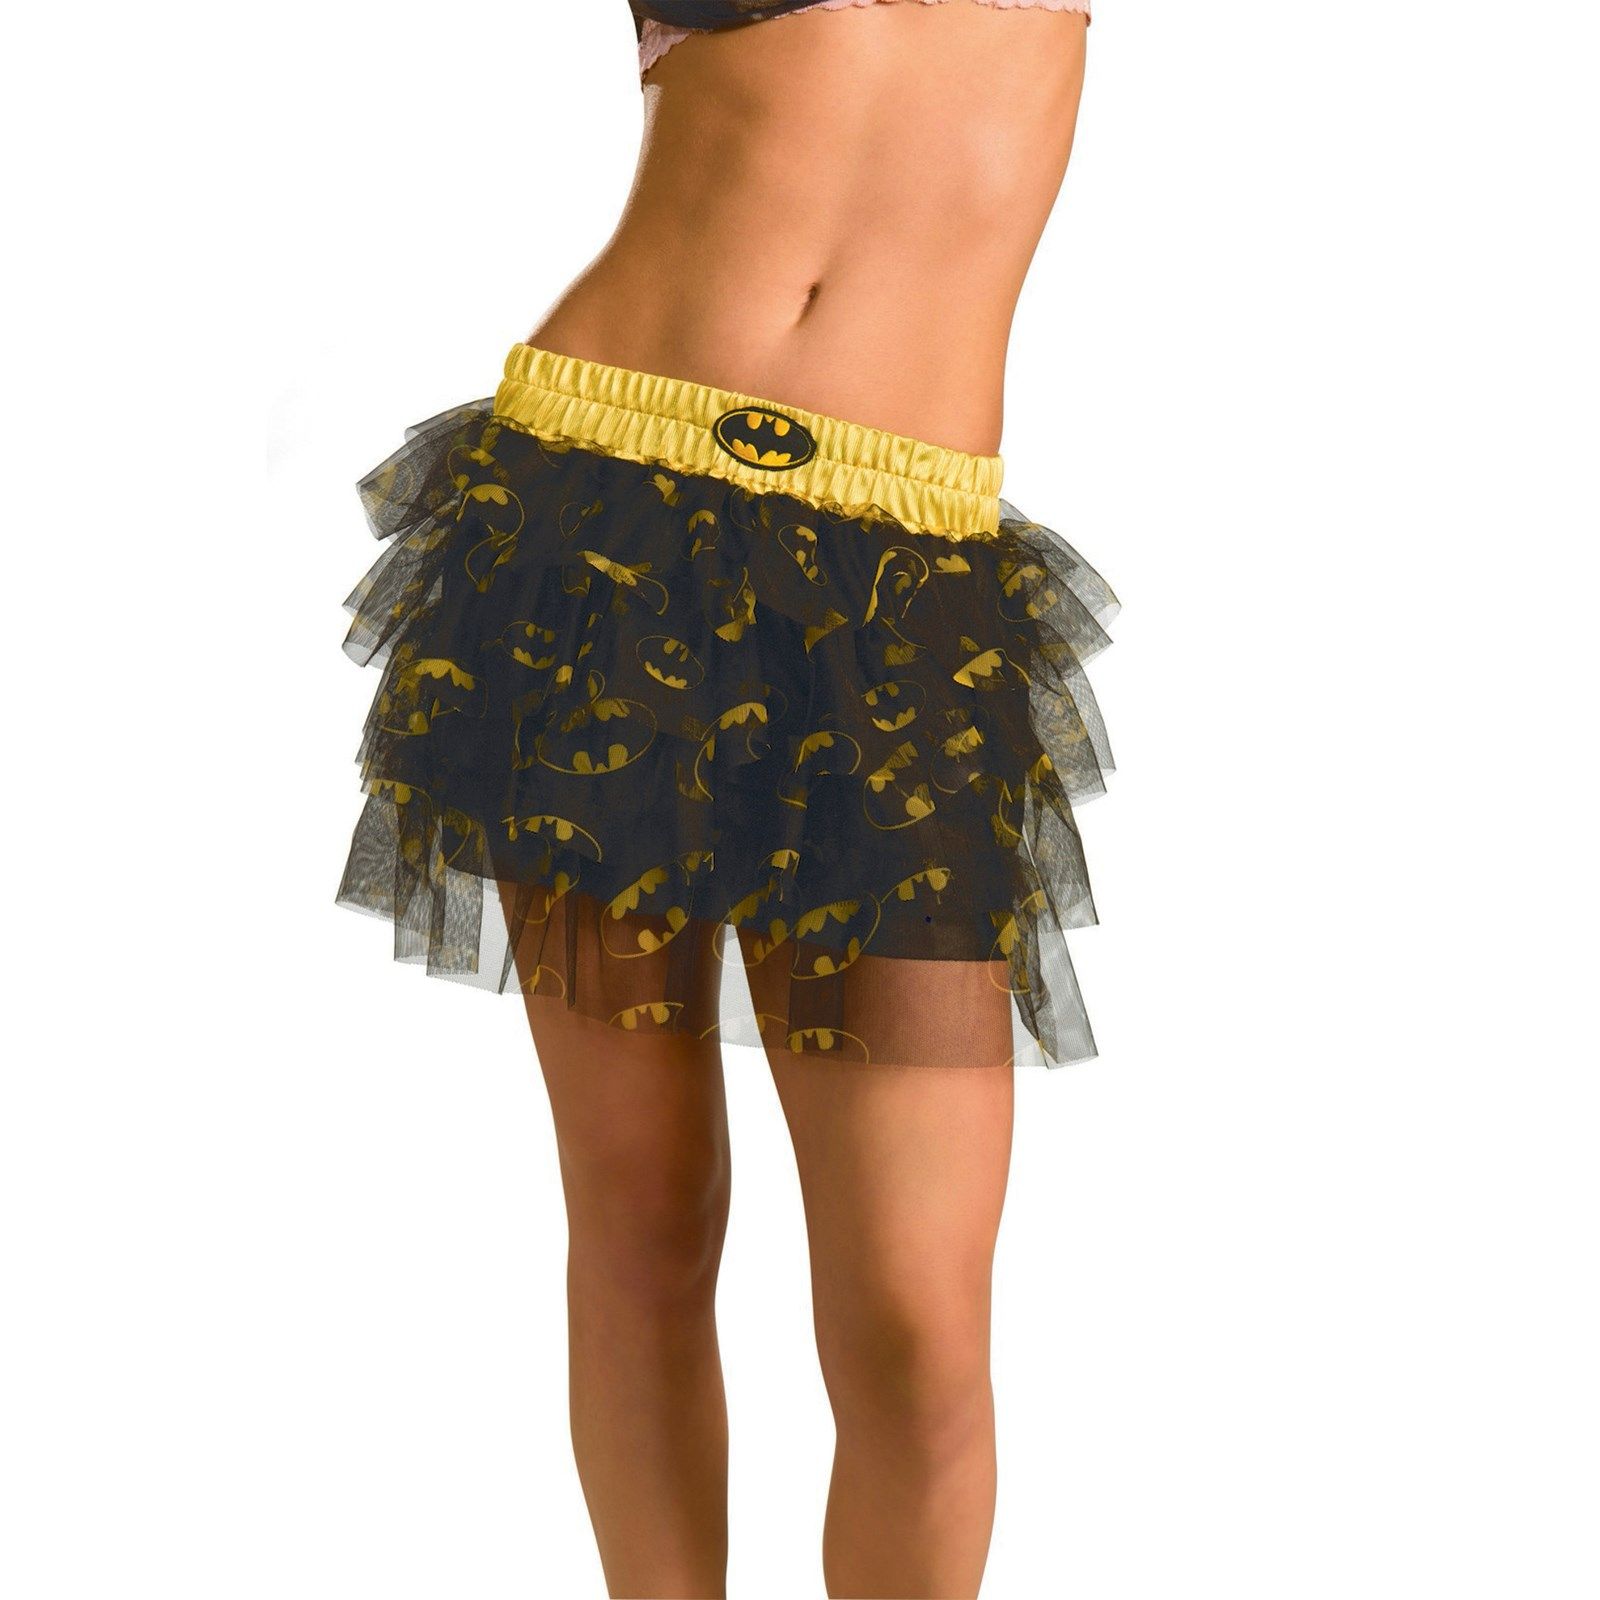 Adult Womens Justice League Size 12 Batgirl Sequin Skirt